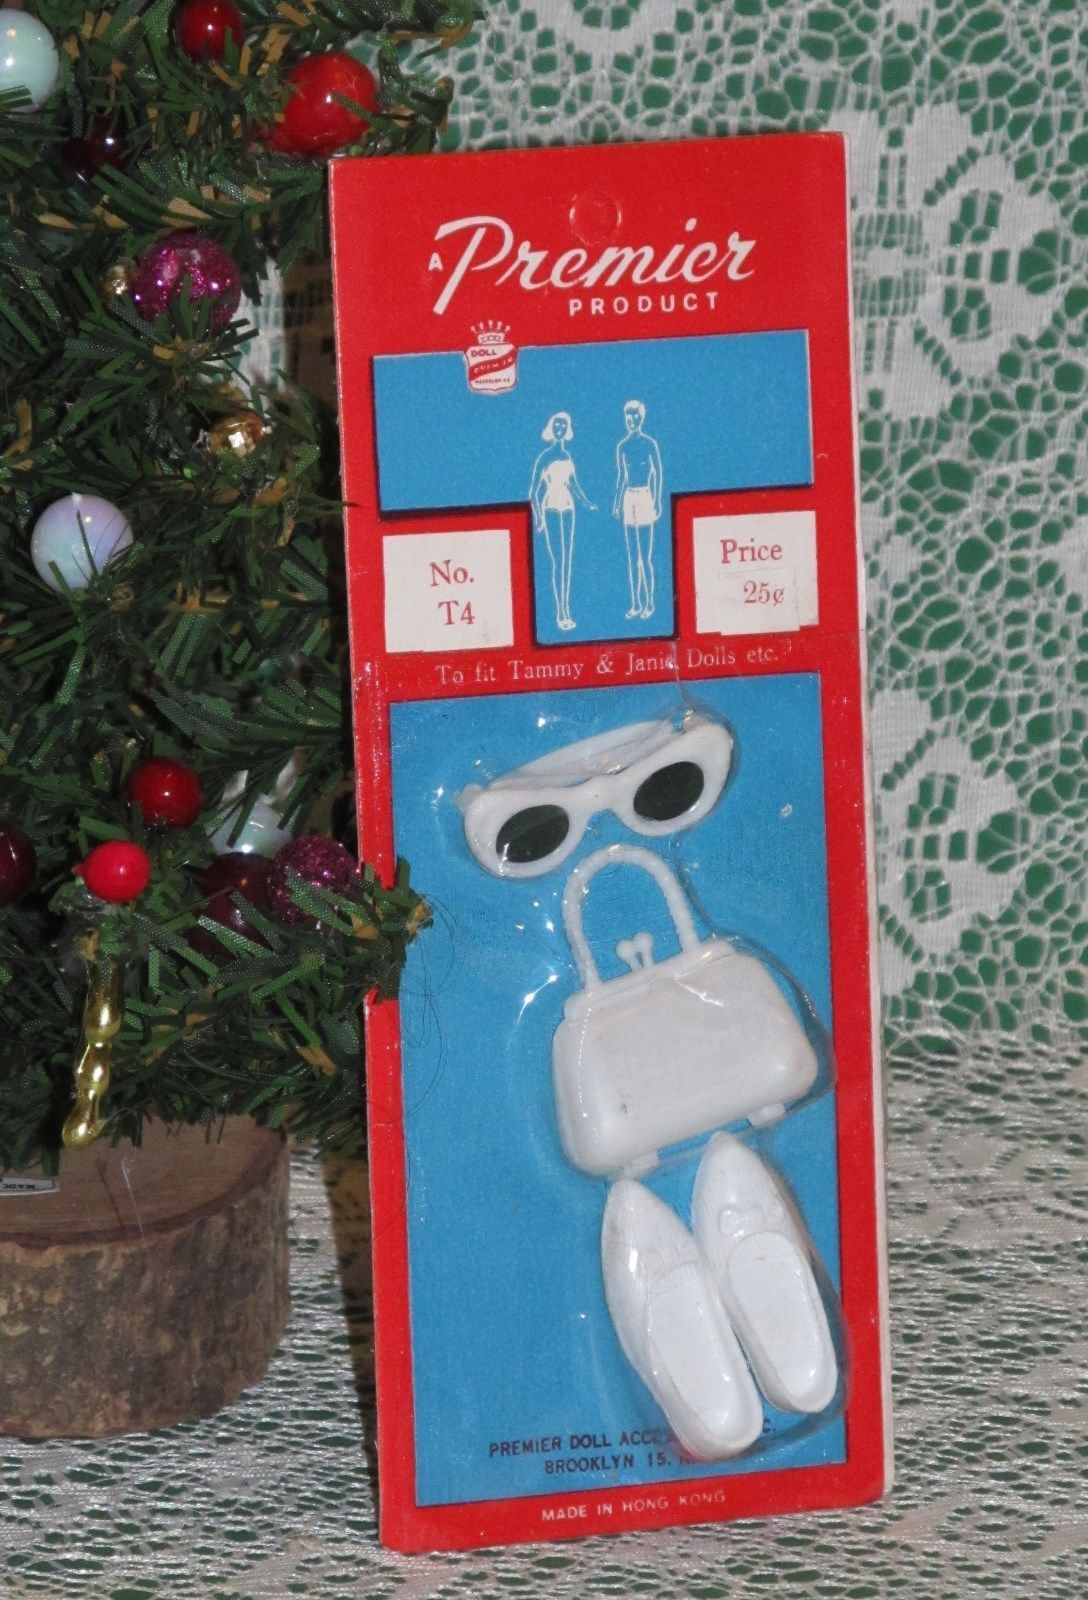 Premier White Sunglasses Handbag and Heels for Tammy Mint on Card | eBay